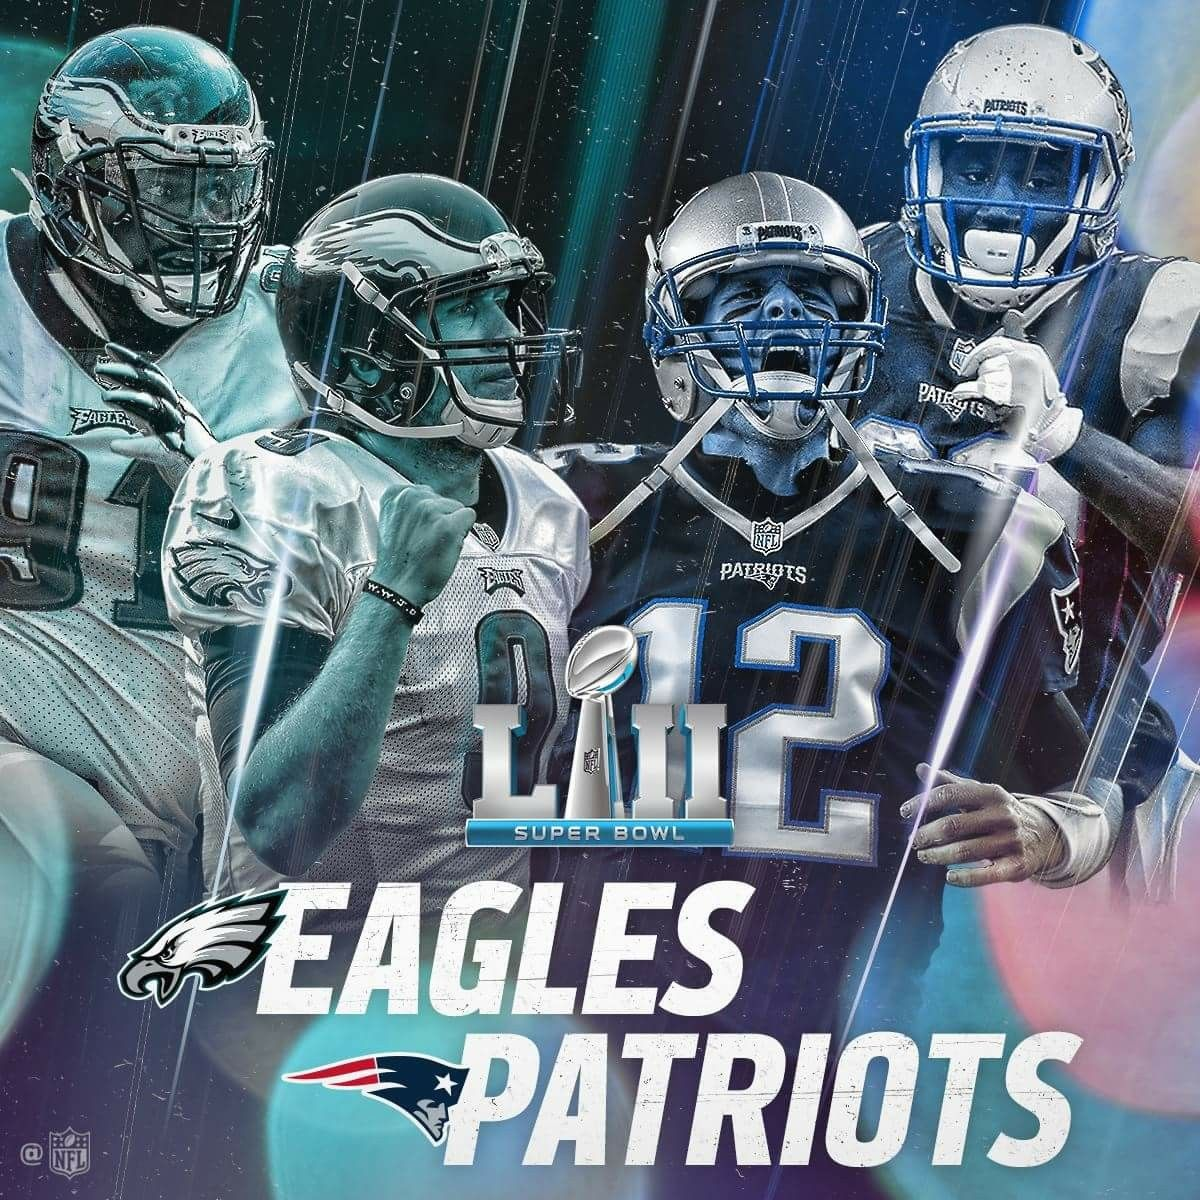 Pin By Darla Mezei On Sports Super Bowl Eagles Vs Eagles Football